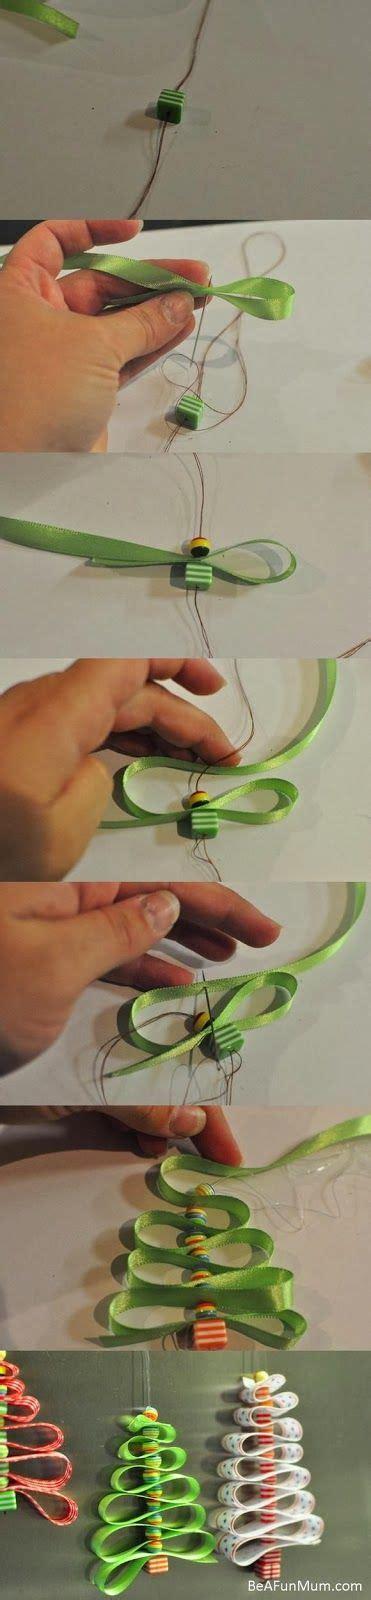 ornament origami violin viola cello diy crafts pin by viola sjakste on christmass pinterest craft